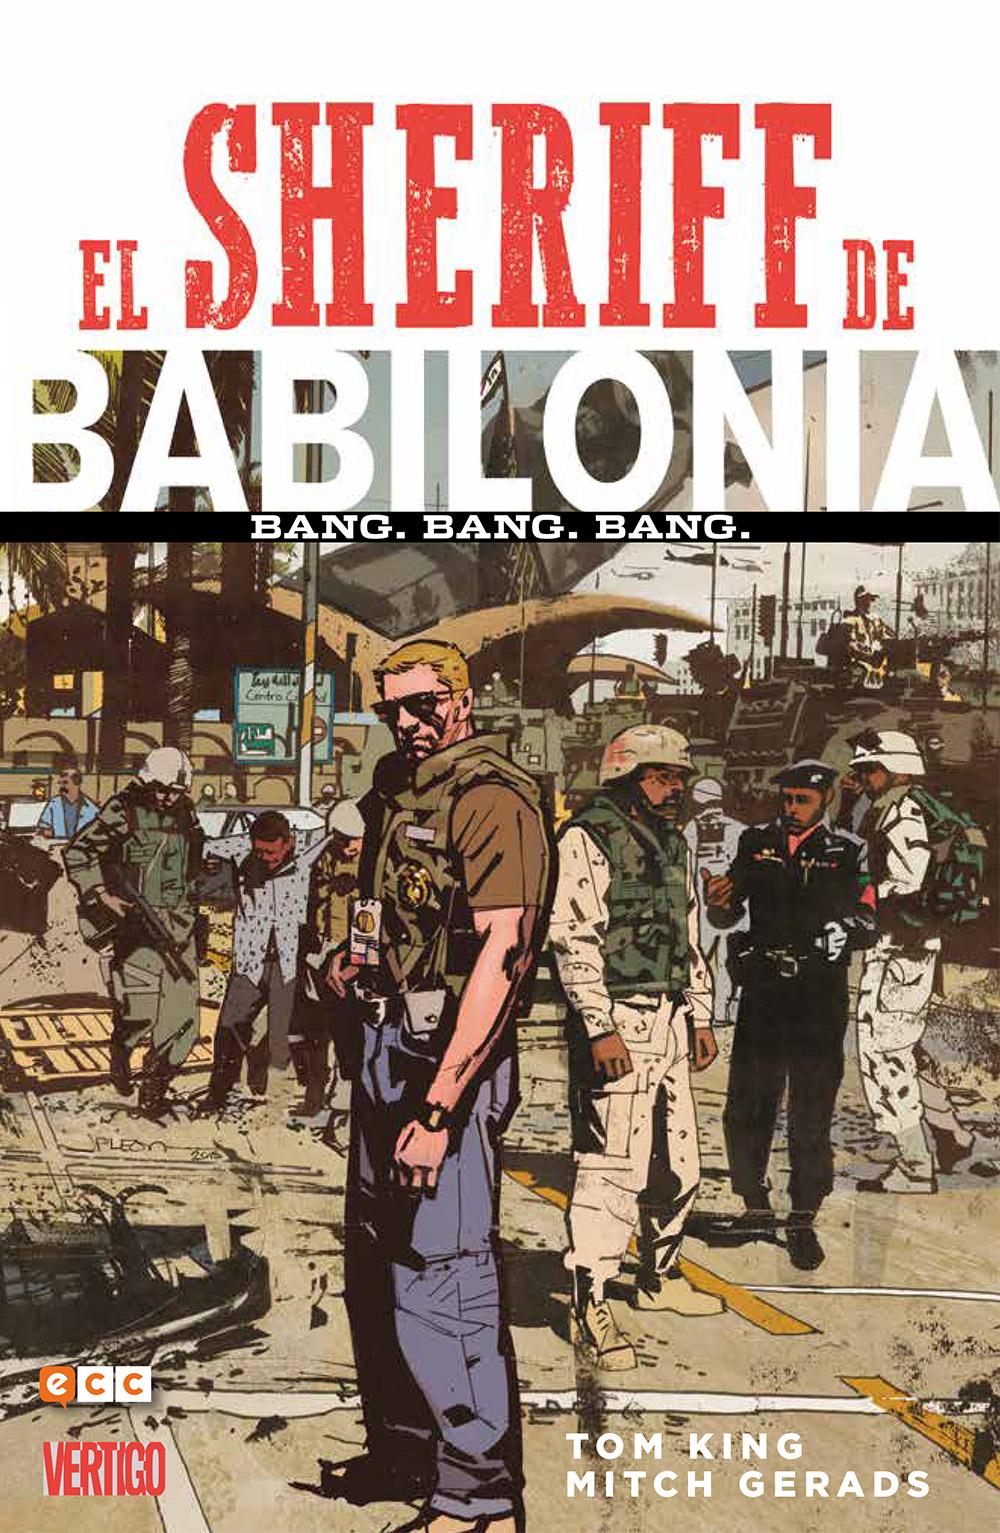 UN POCO DE NOVENO ARTE - Página 32 El_sherif_de_babilonia_bang_bang_bang